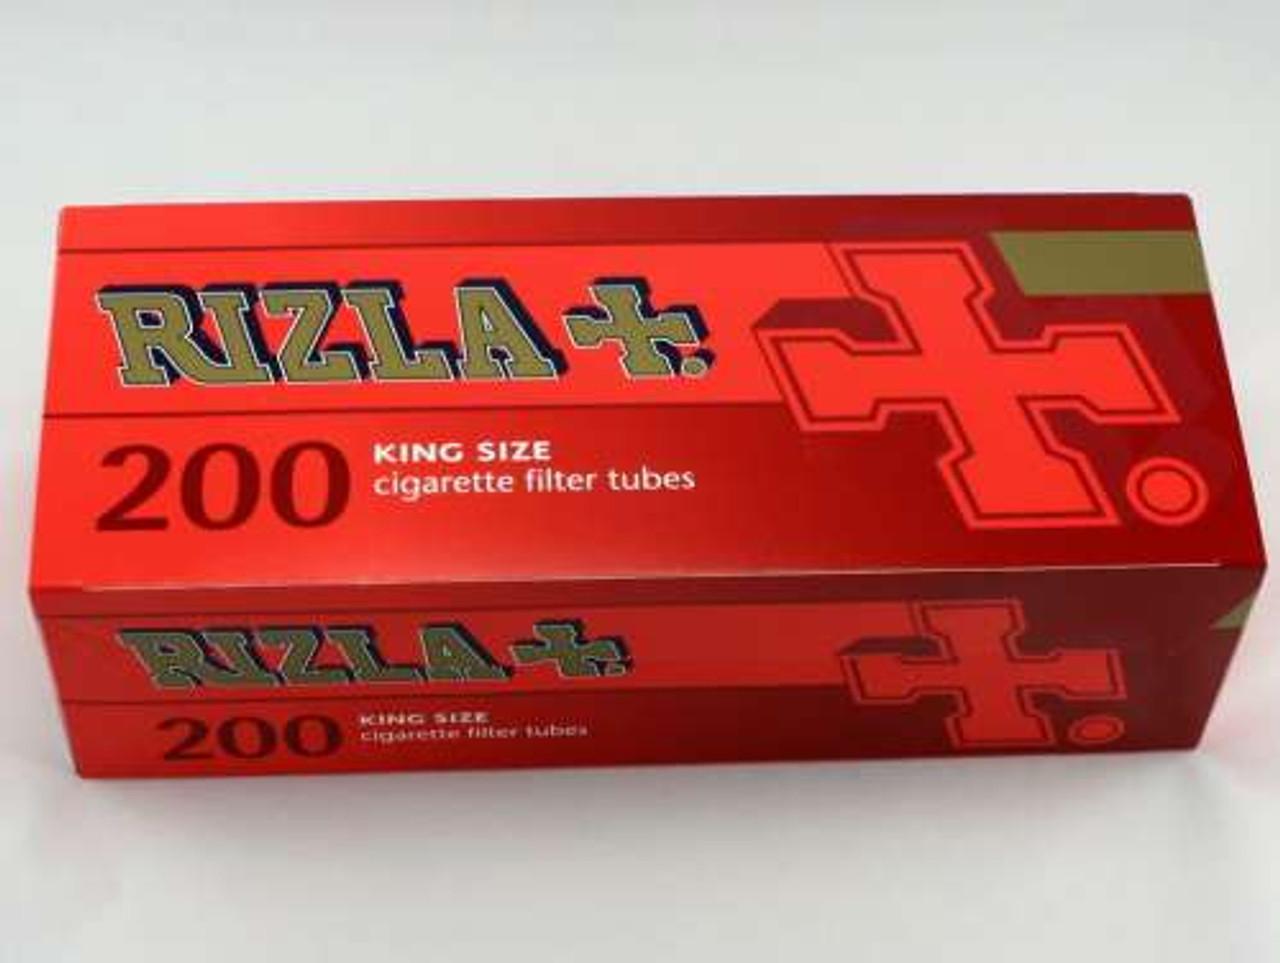 Rizla Full Flavor King Size Cigarette Tubes